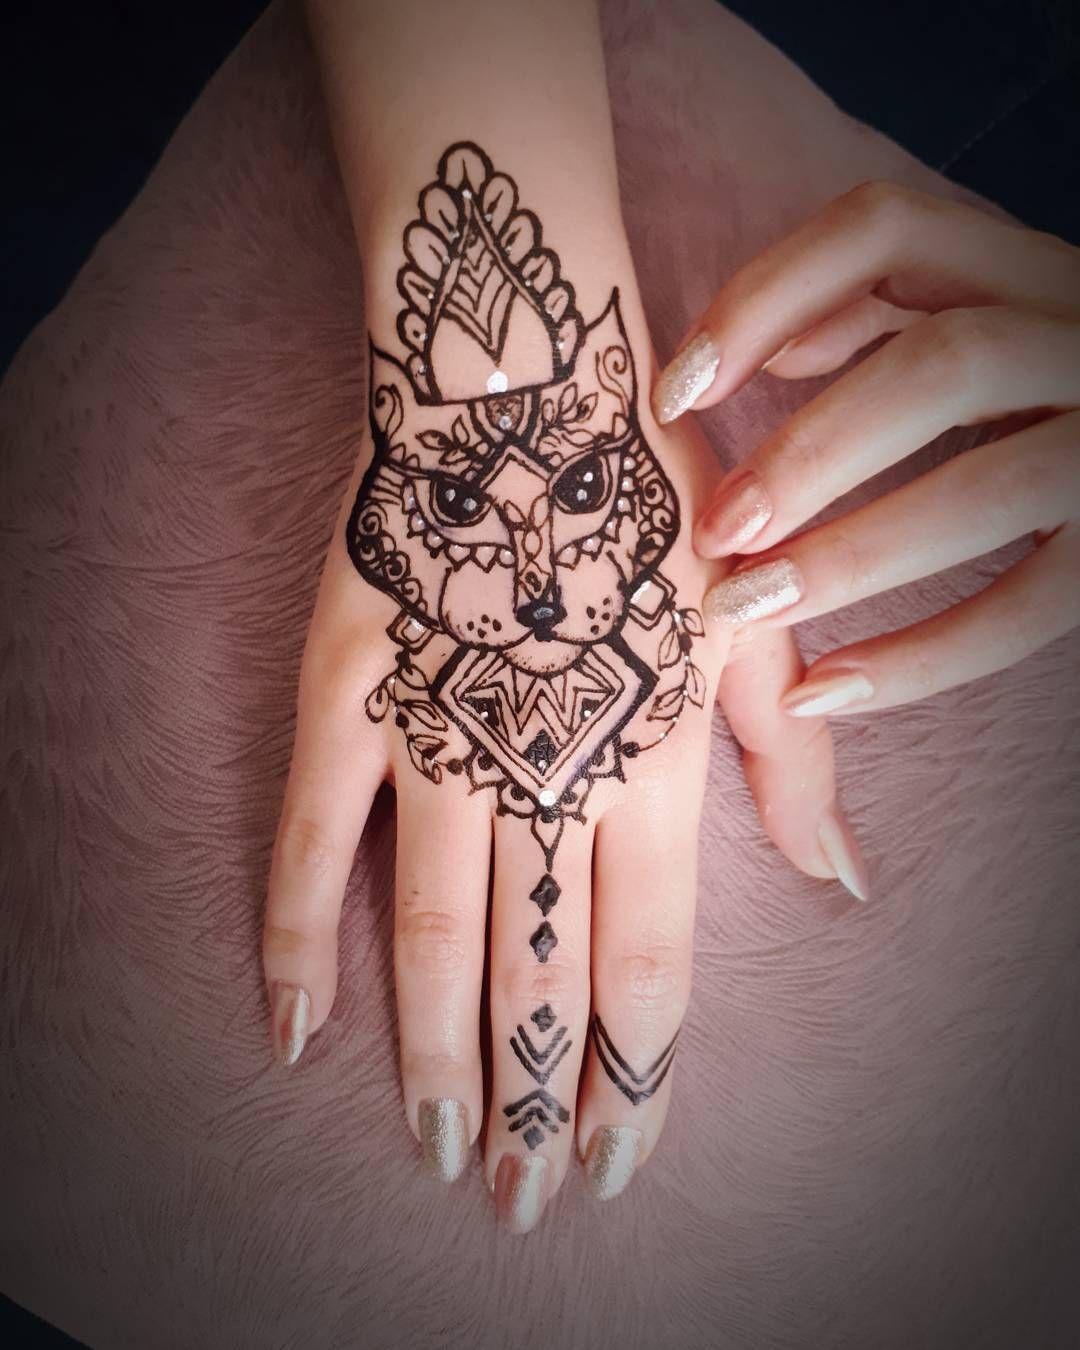 نقش حنا توسط شهرزاد بدون شابلون Henna Tattoos Pinterest